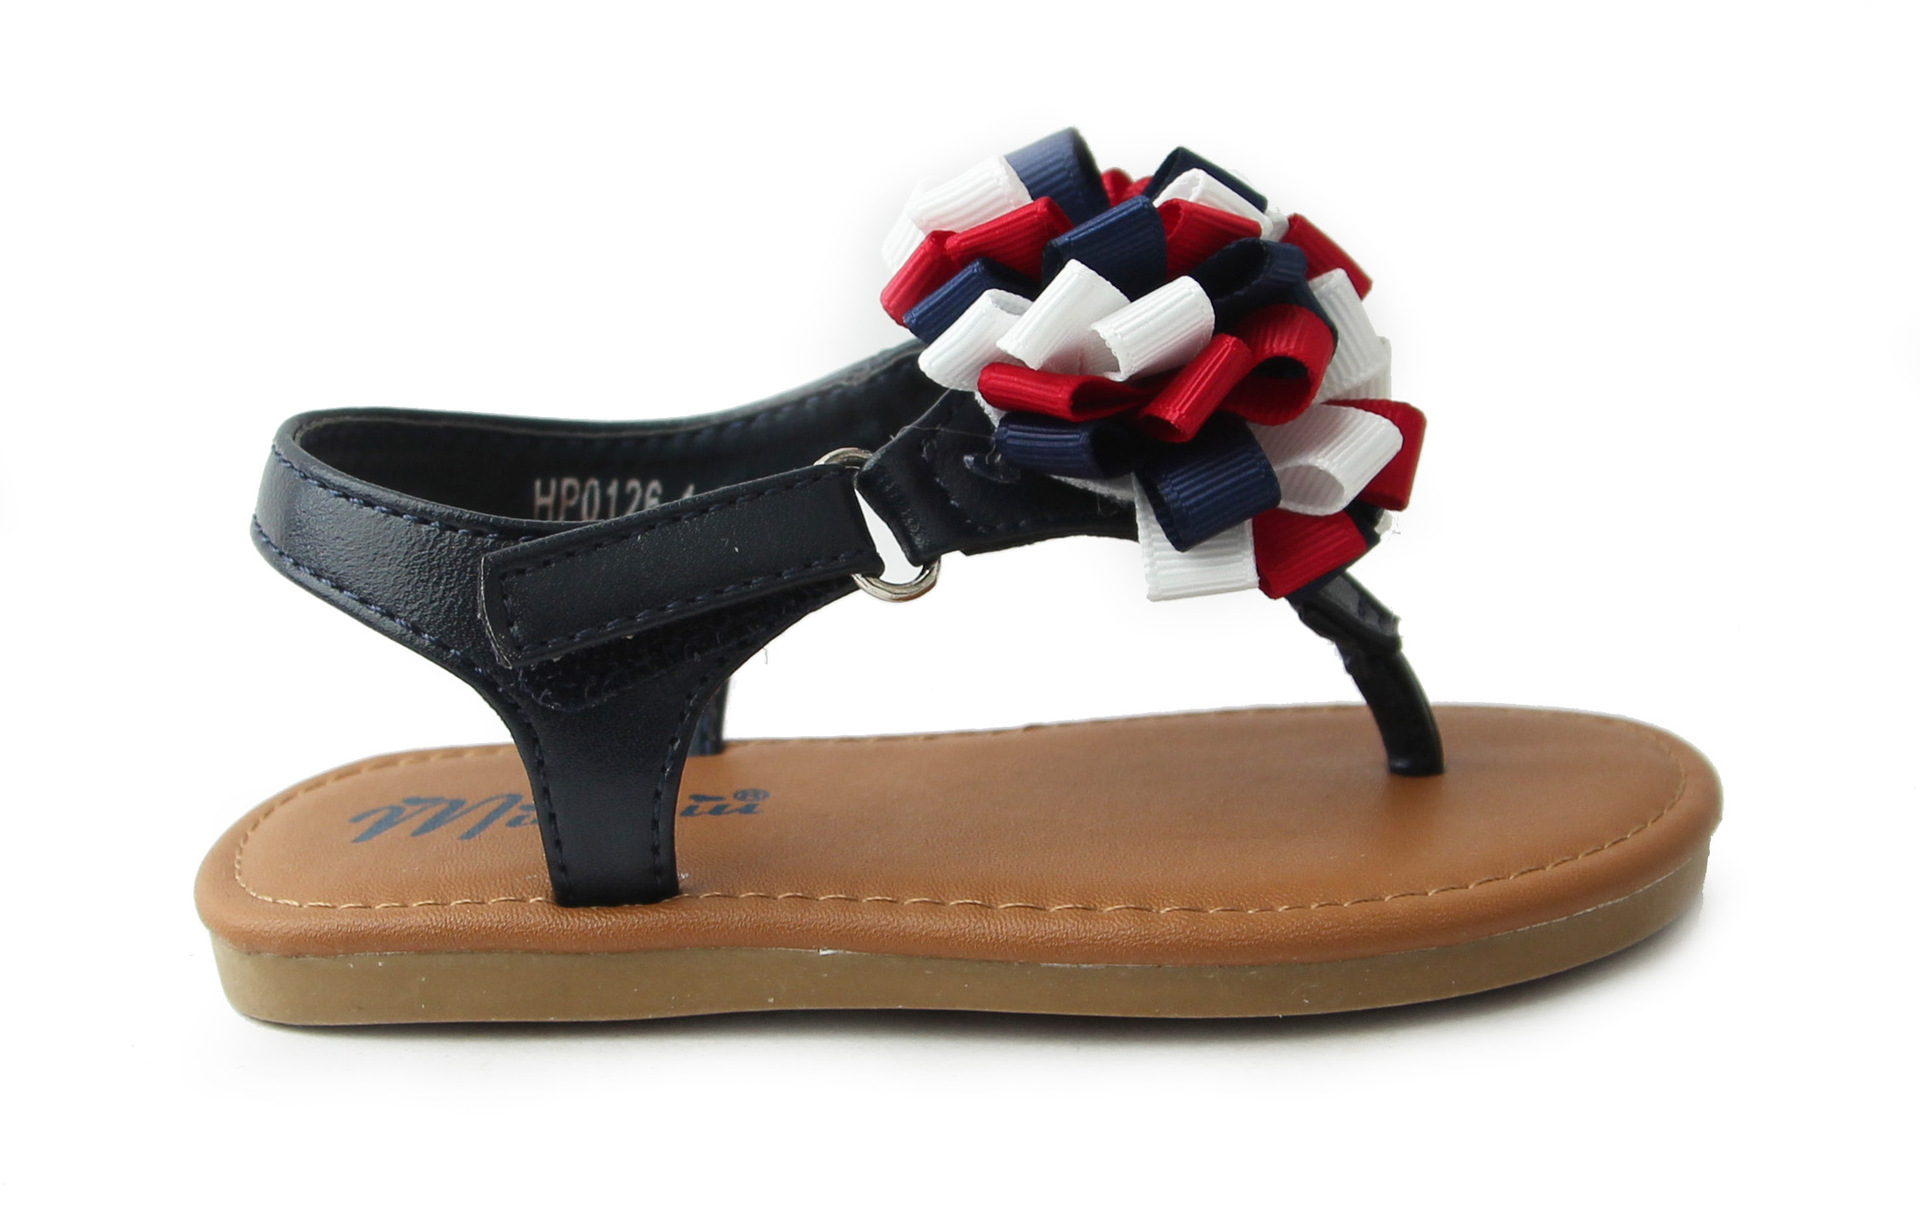 Цветок дети обувь девочки обувь лето принцесса сандалии девочки сандалии дети вьетнамки сандалии